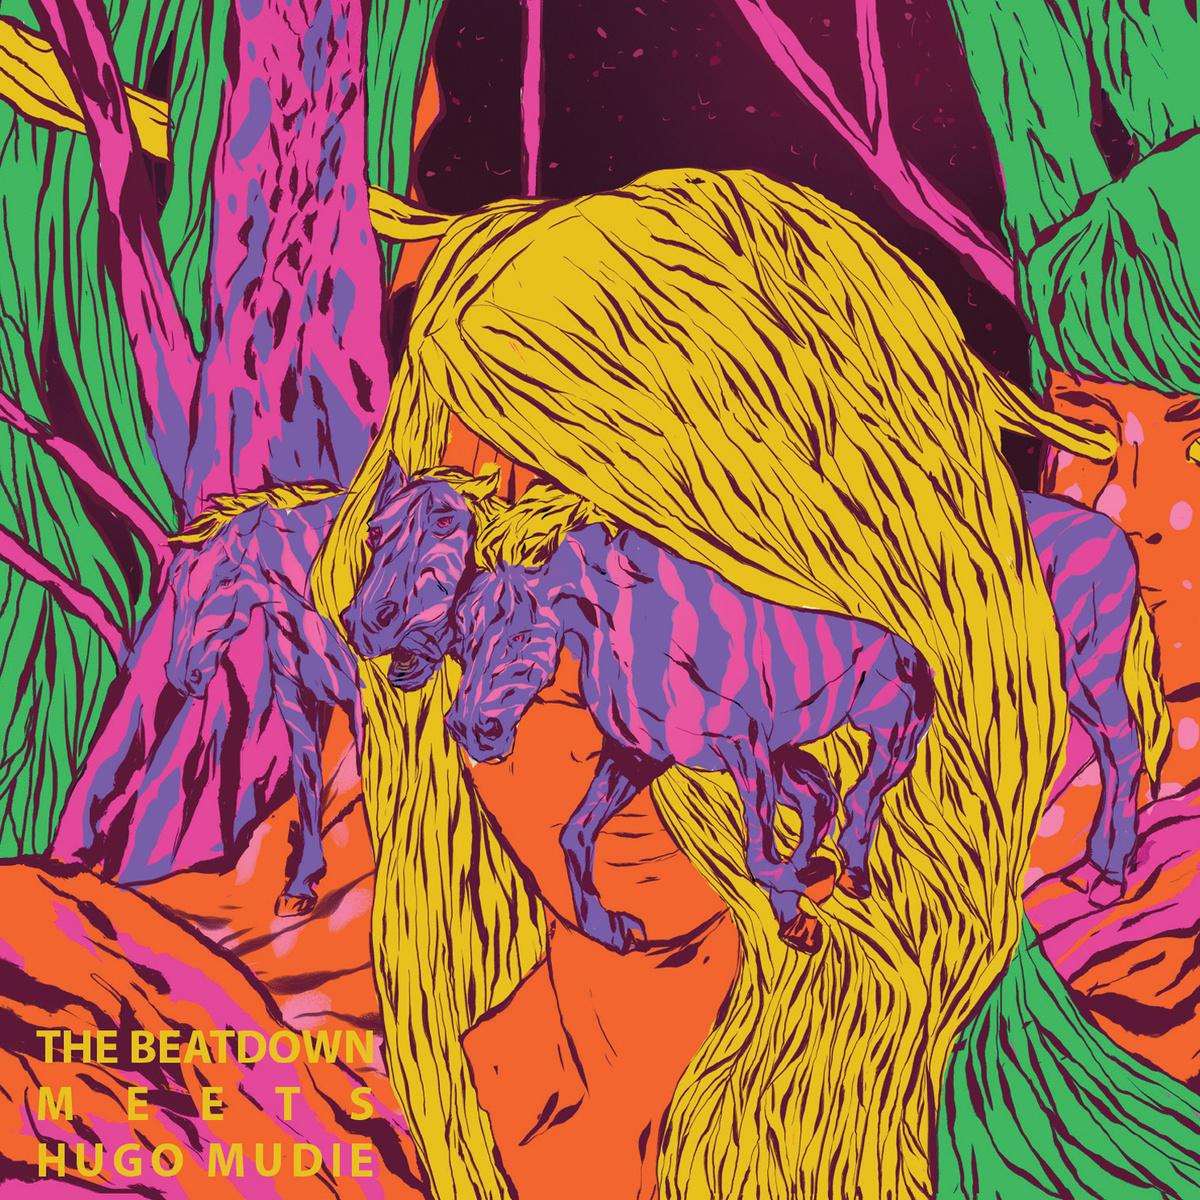 The Beatdown Meets Hugo Mudie Cover Art